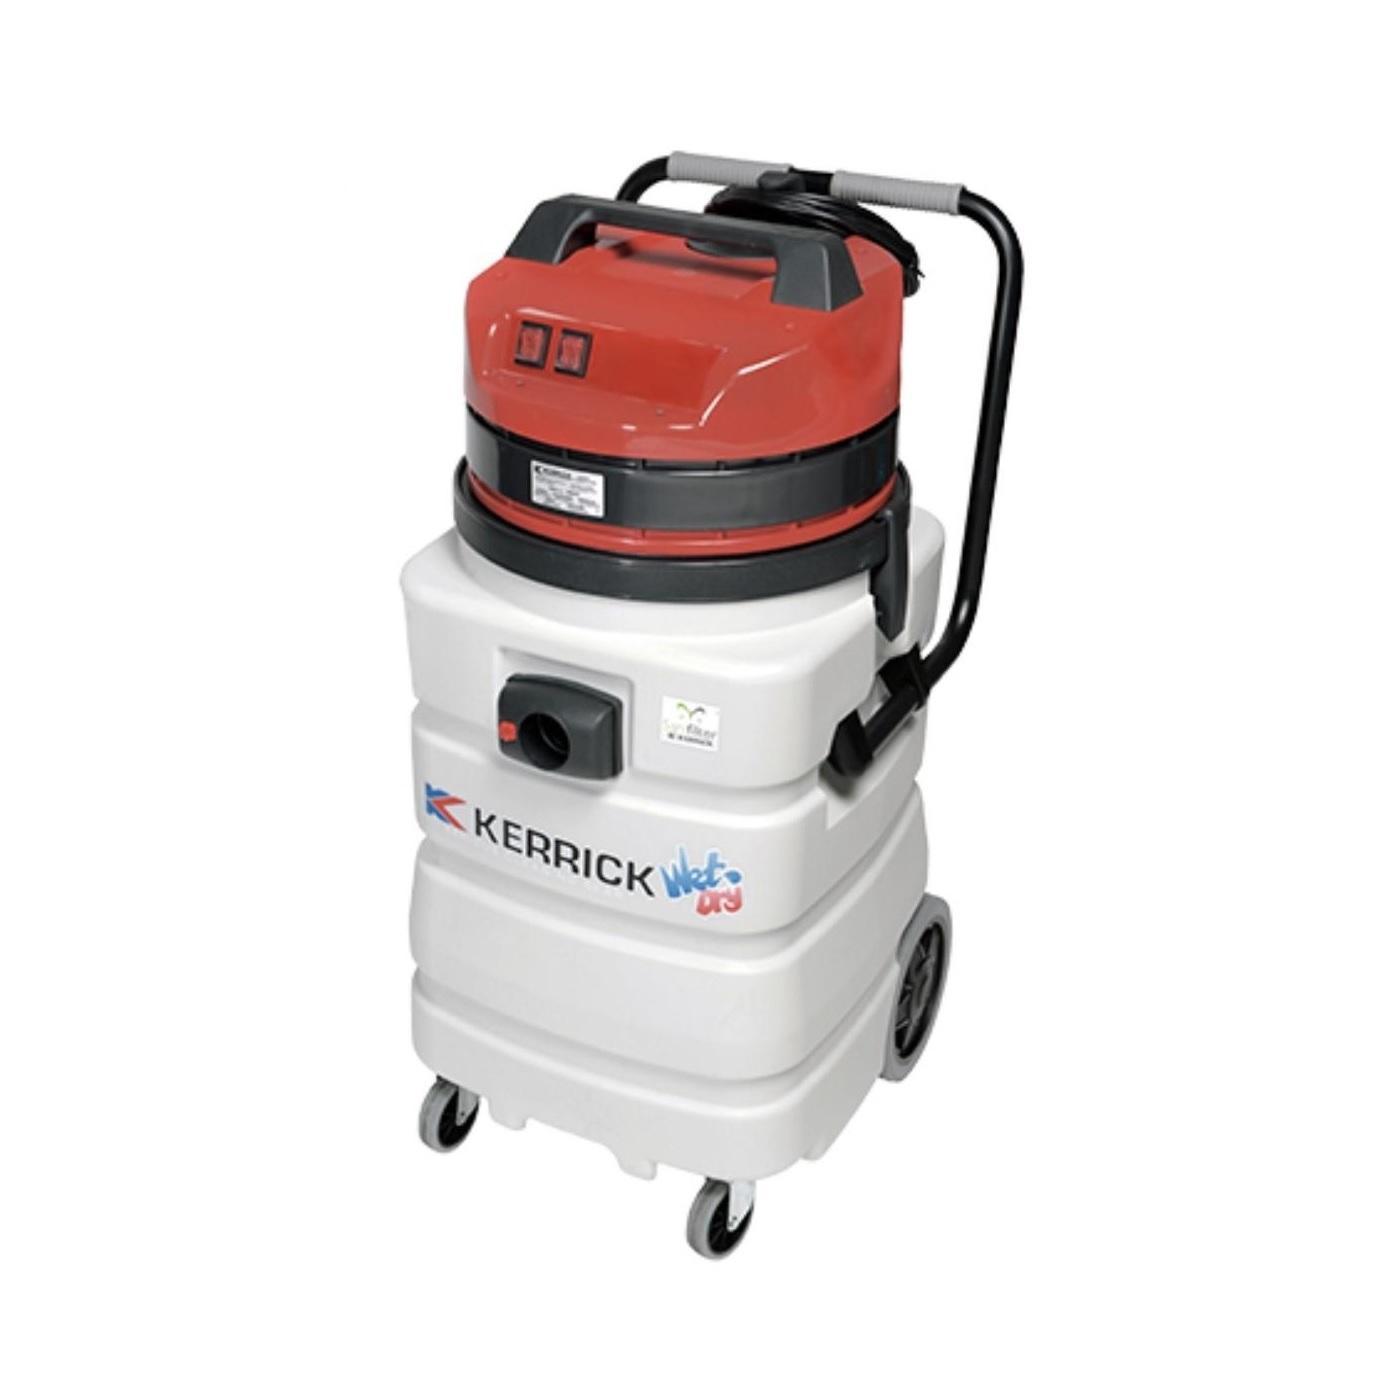 Kerrick 623PL Wet and Dry Vacuum